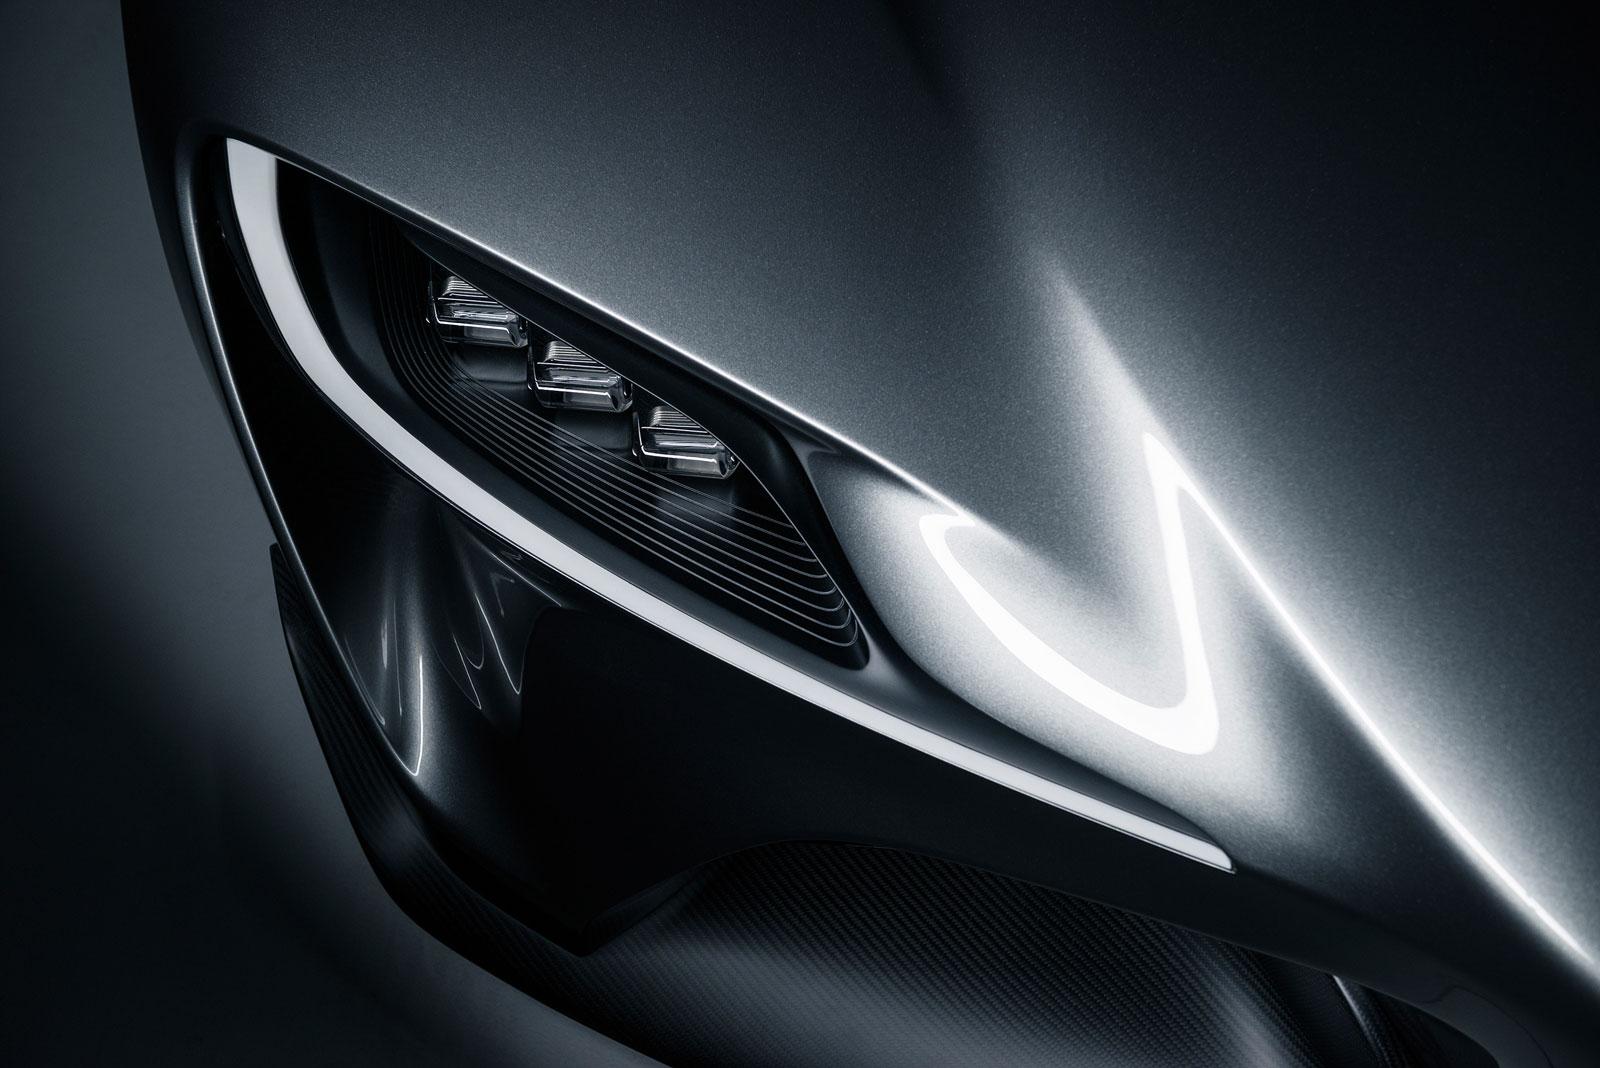 02-Toyota-FT-1-Graphite-Concept-Headlight.jpg (JPEG Image, 1600×1068 pixels) - Scaled (80%)